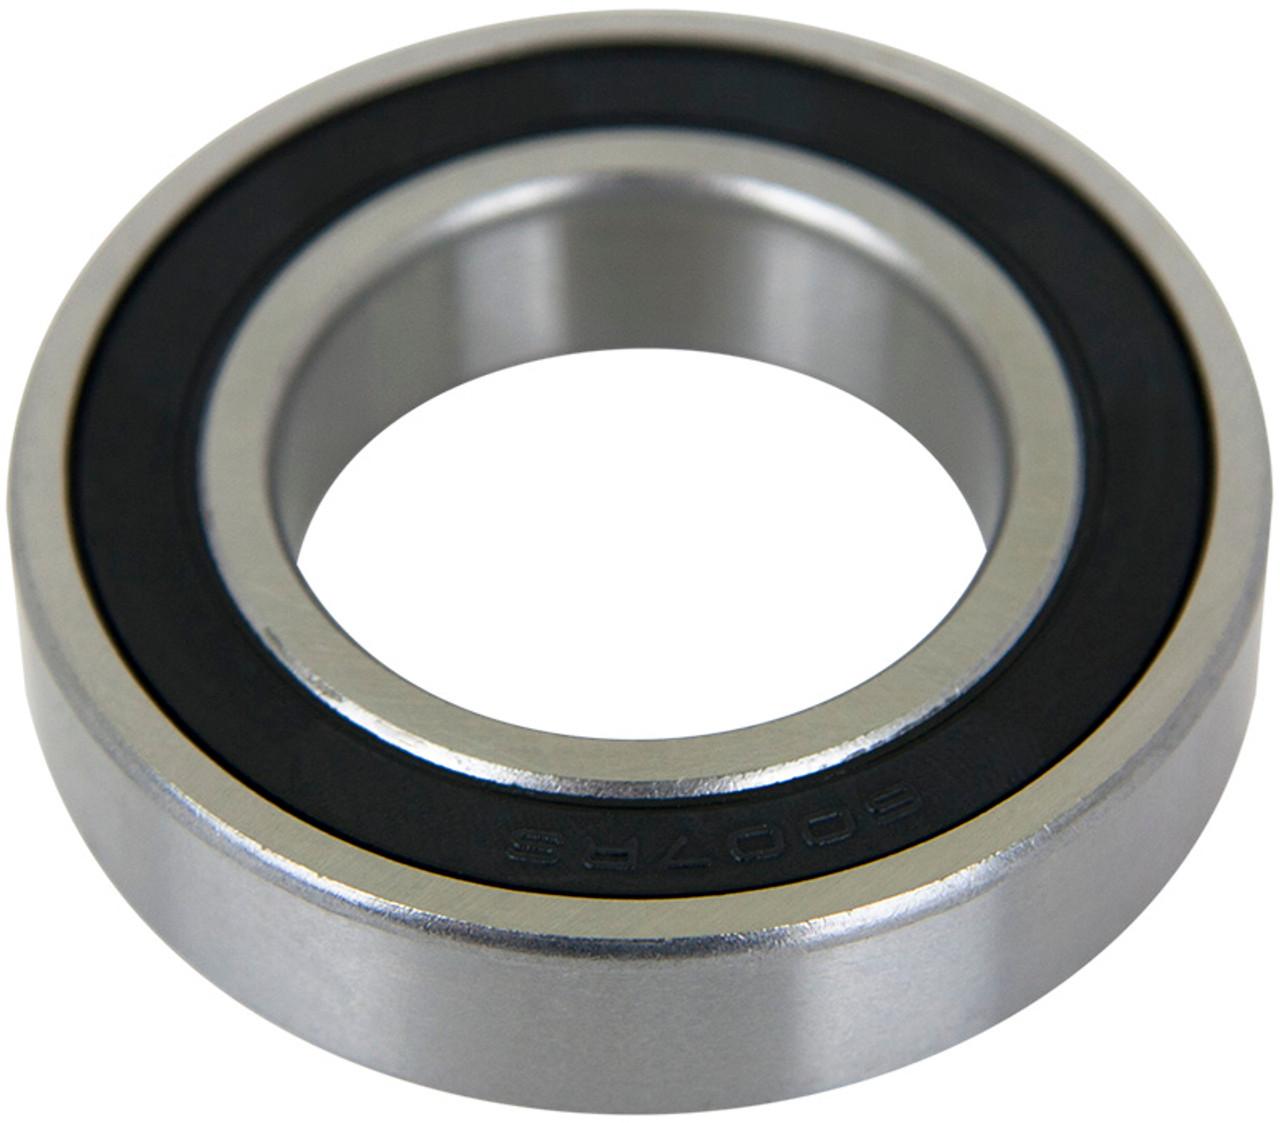 MarineKinetix MK450 or MK4+ yaw axis bearing